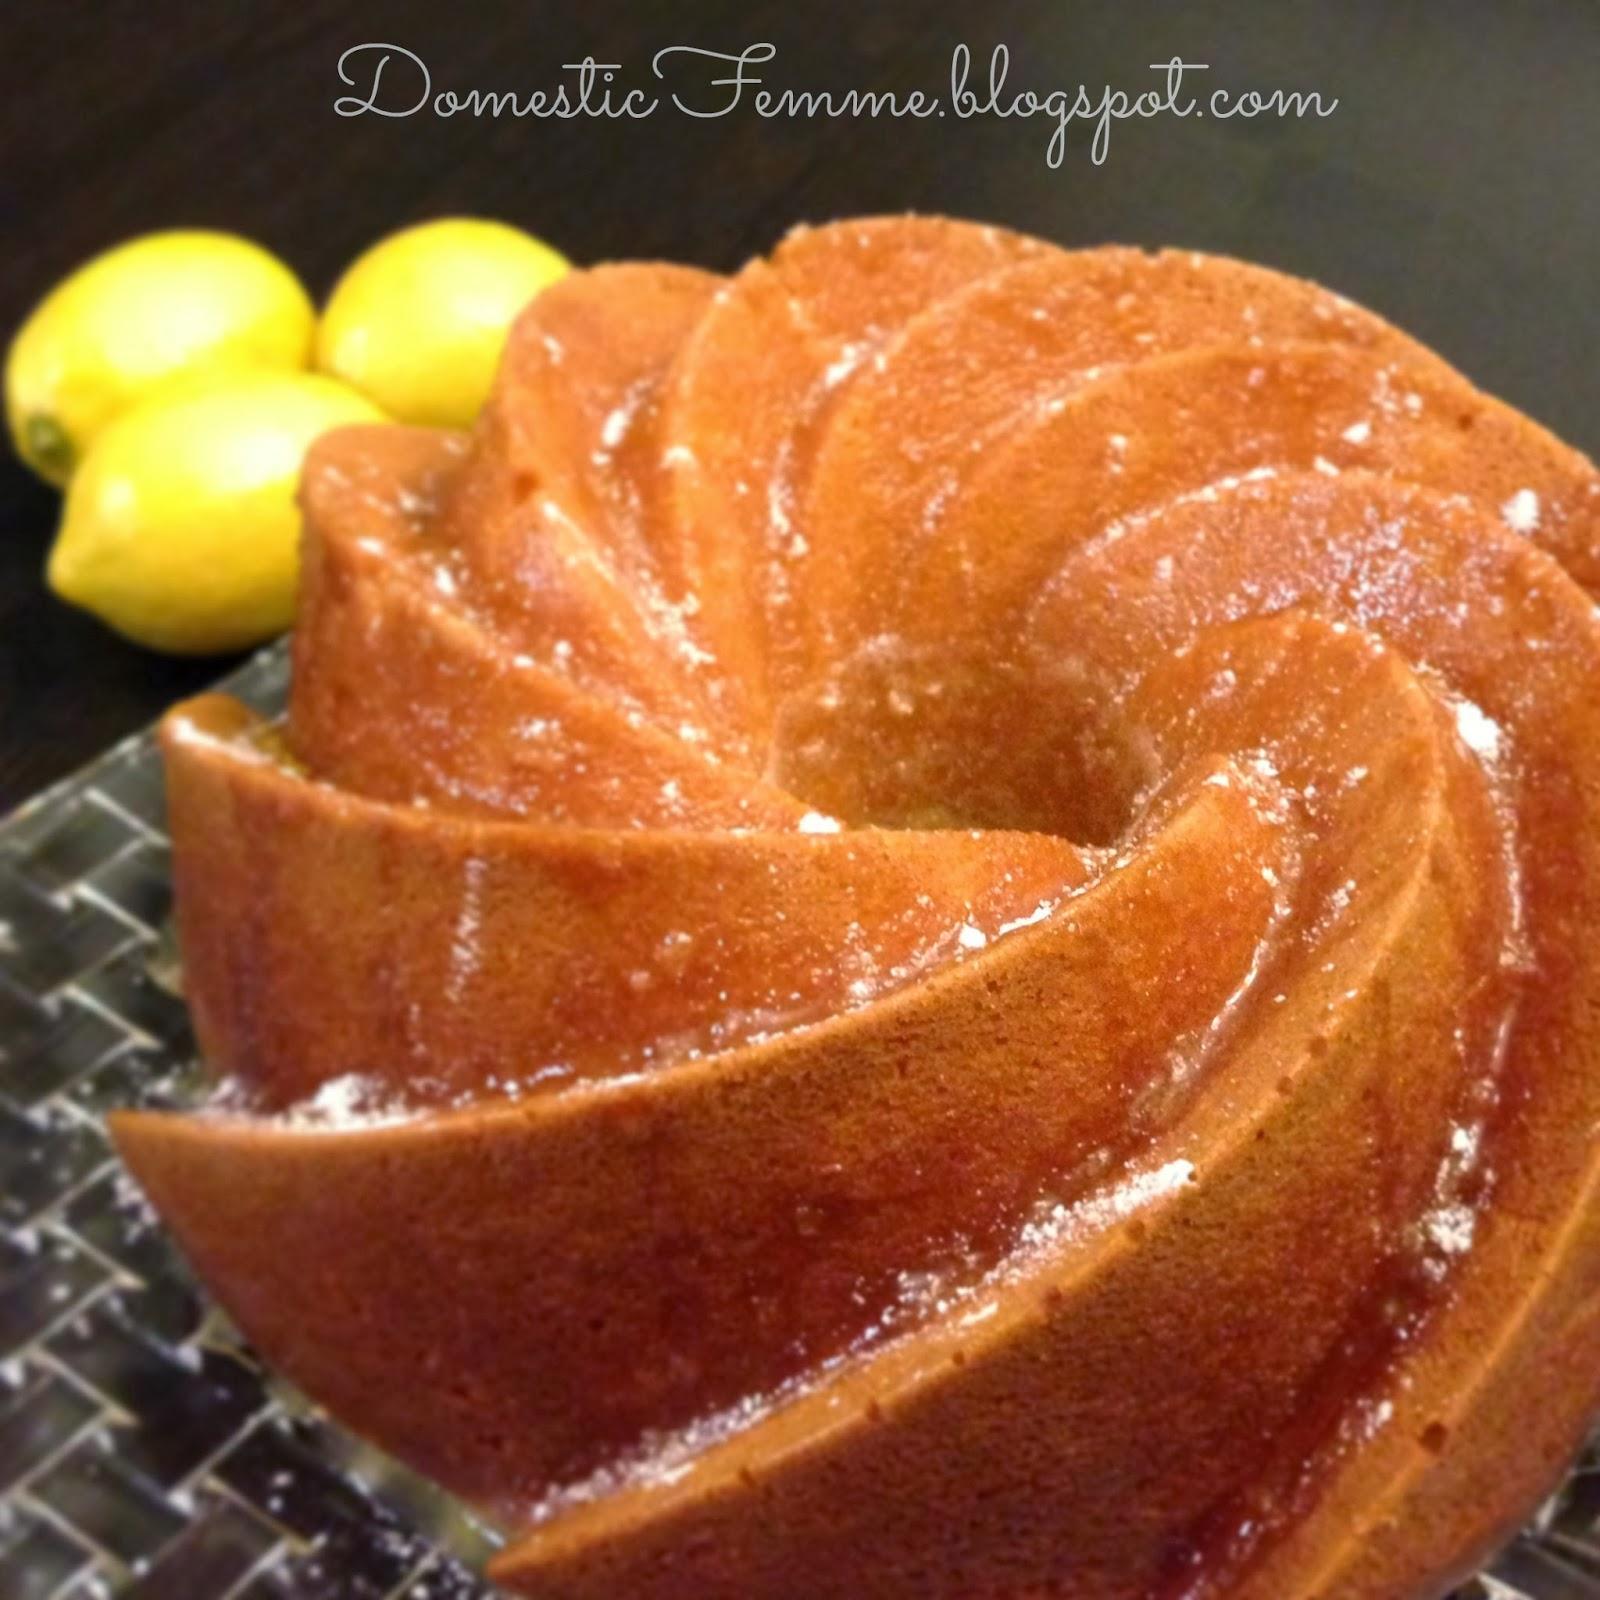 Domestic Femme Lemon Bundt Cake With Citrus Glaze